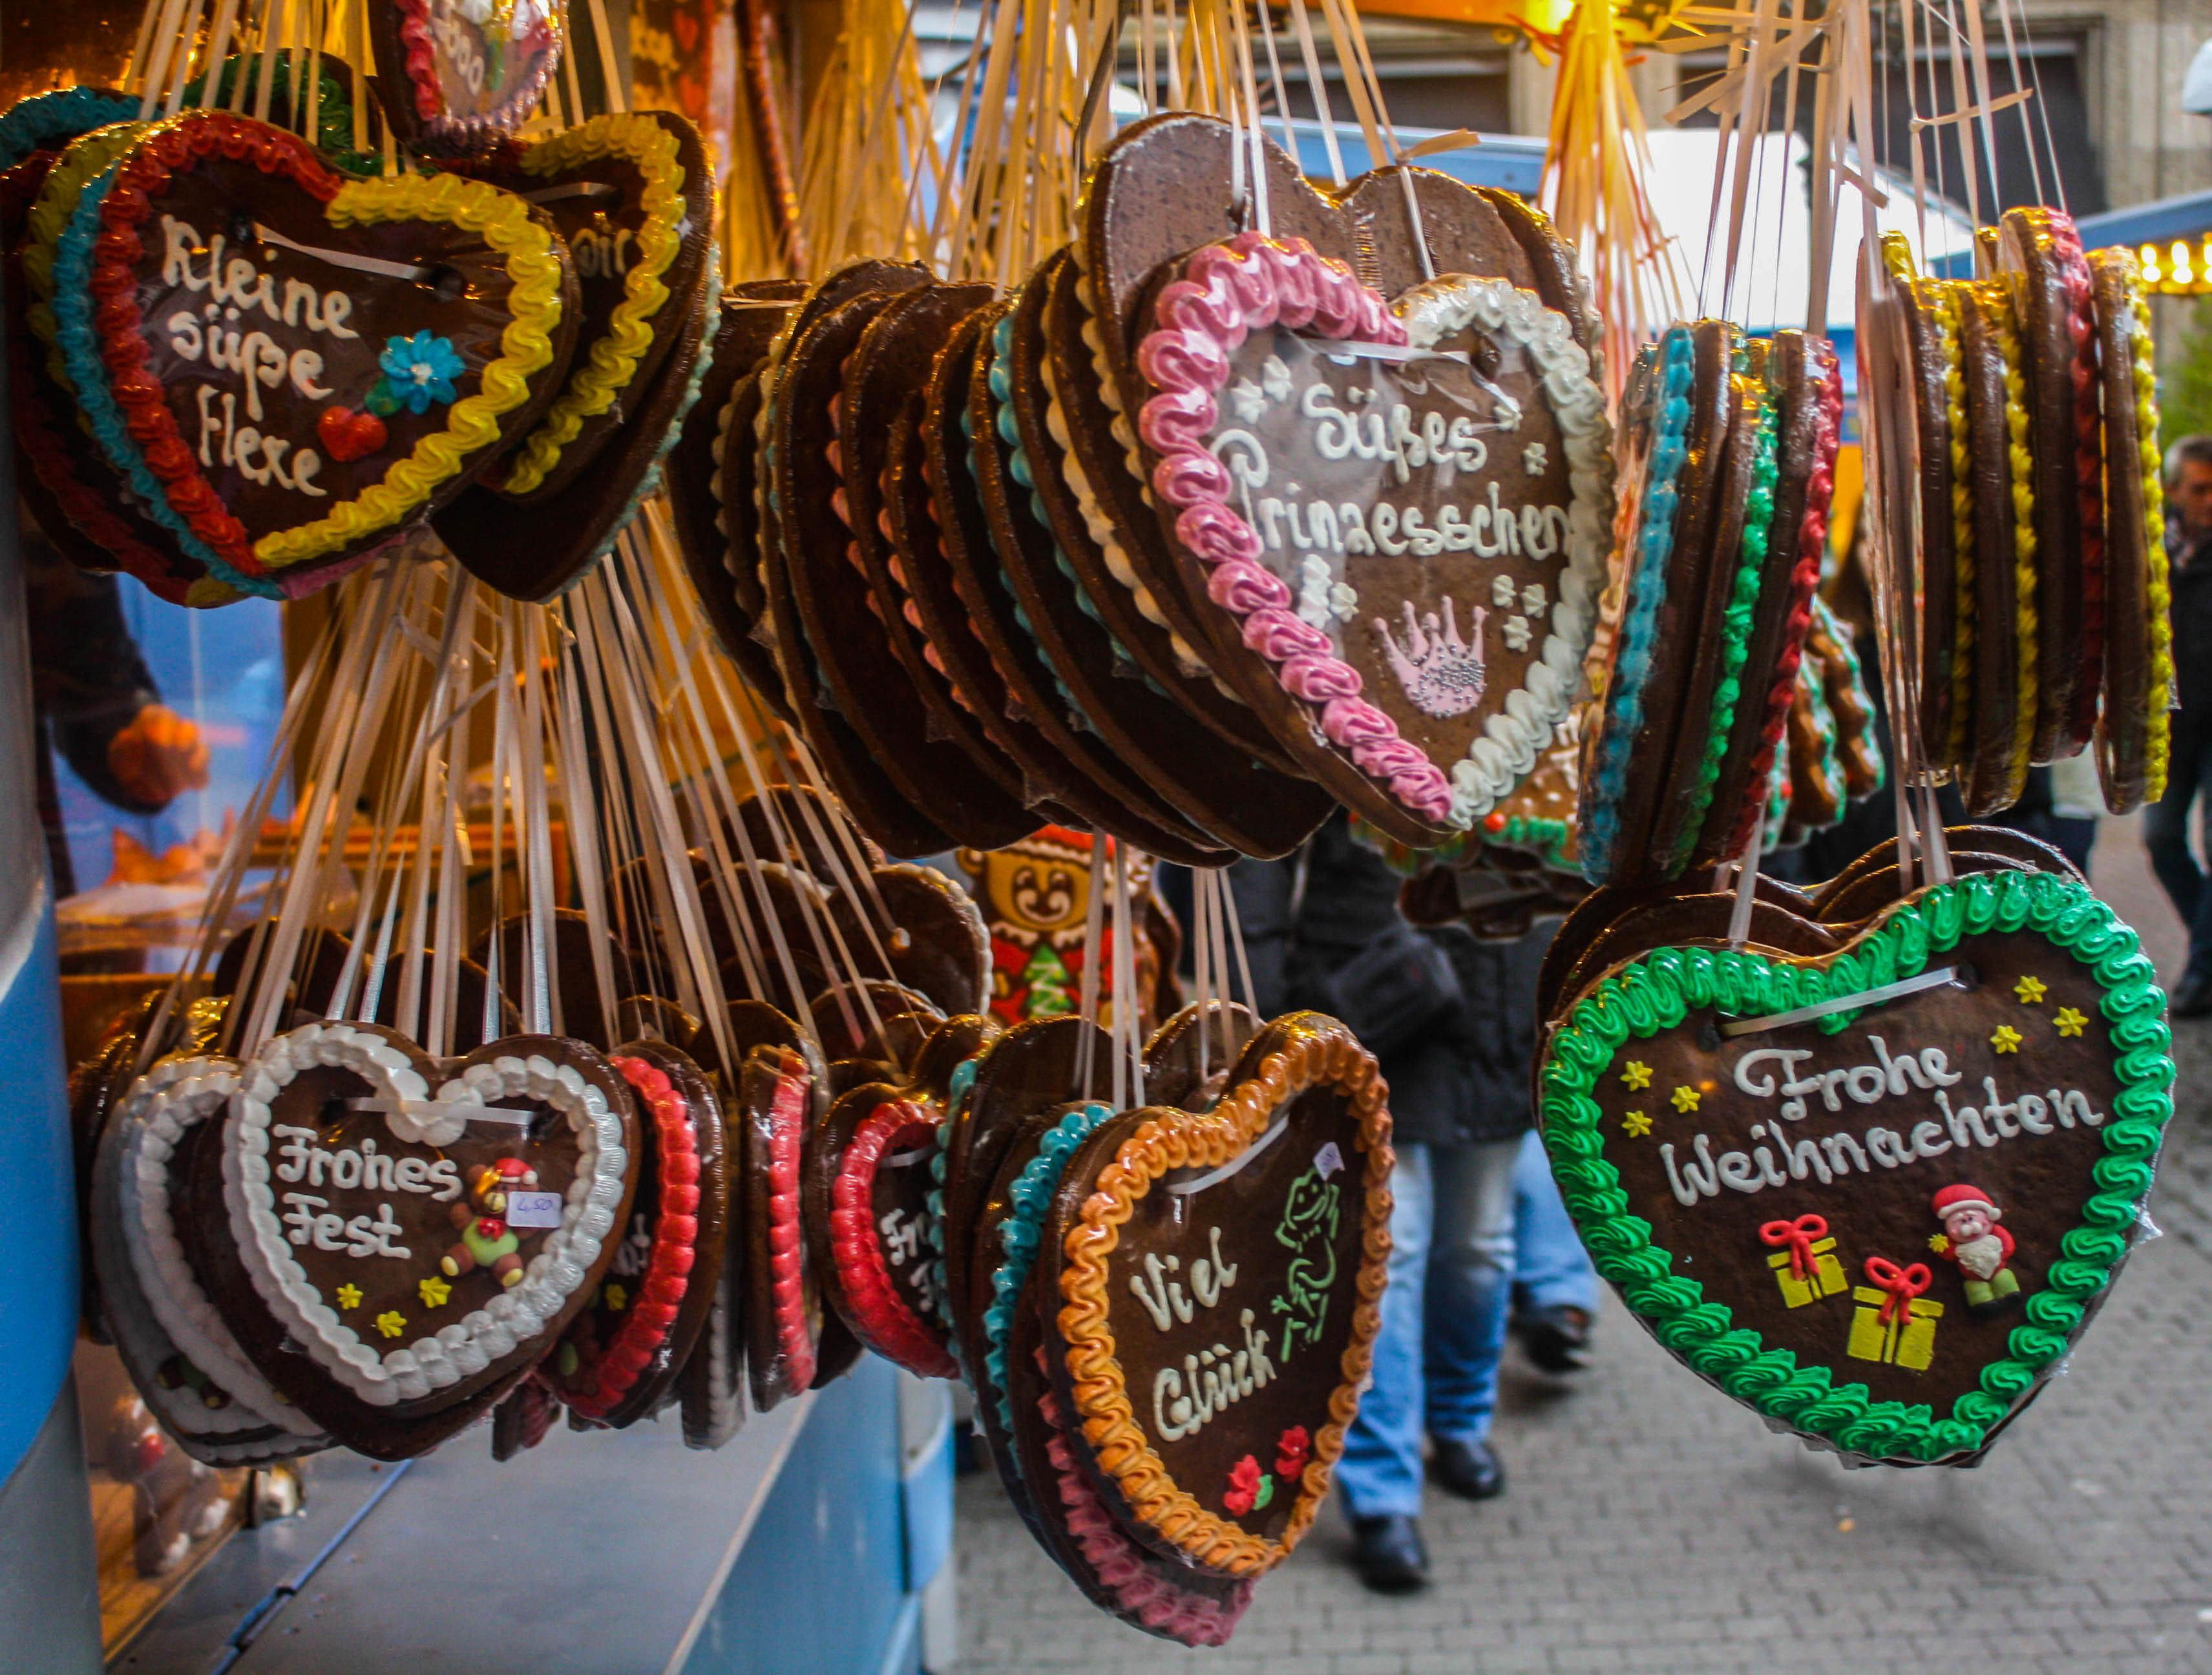 dusseldorf germany - Christmas Market Dc